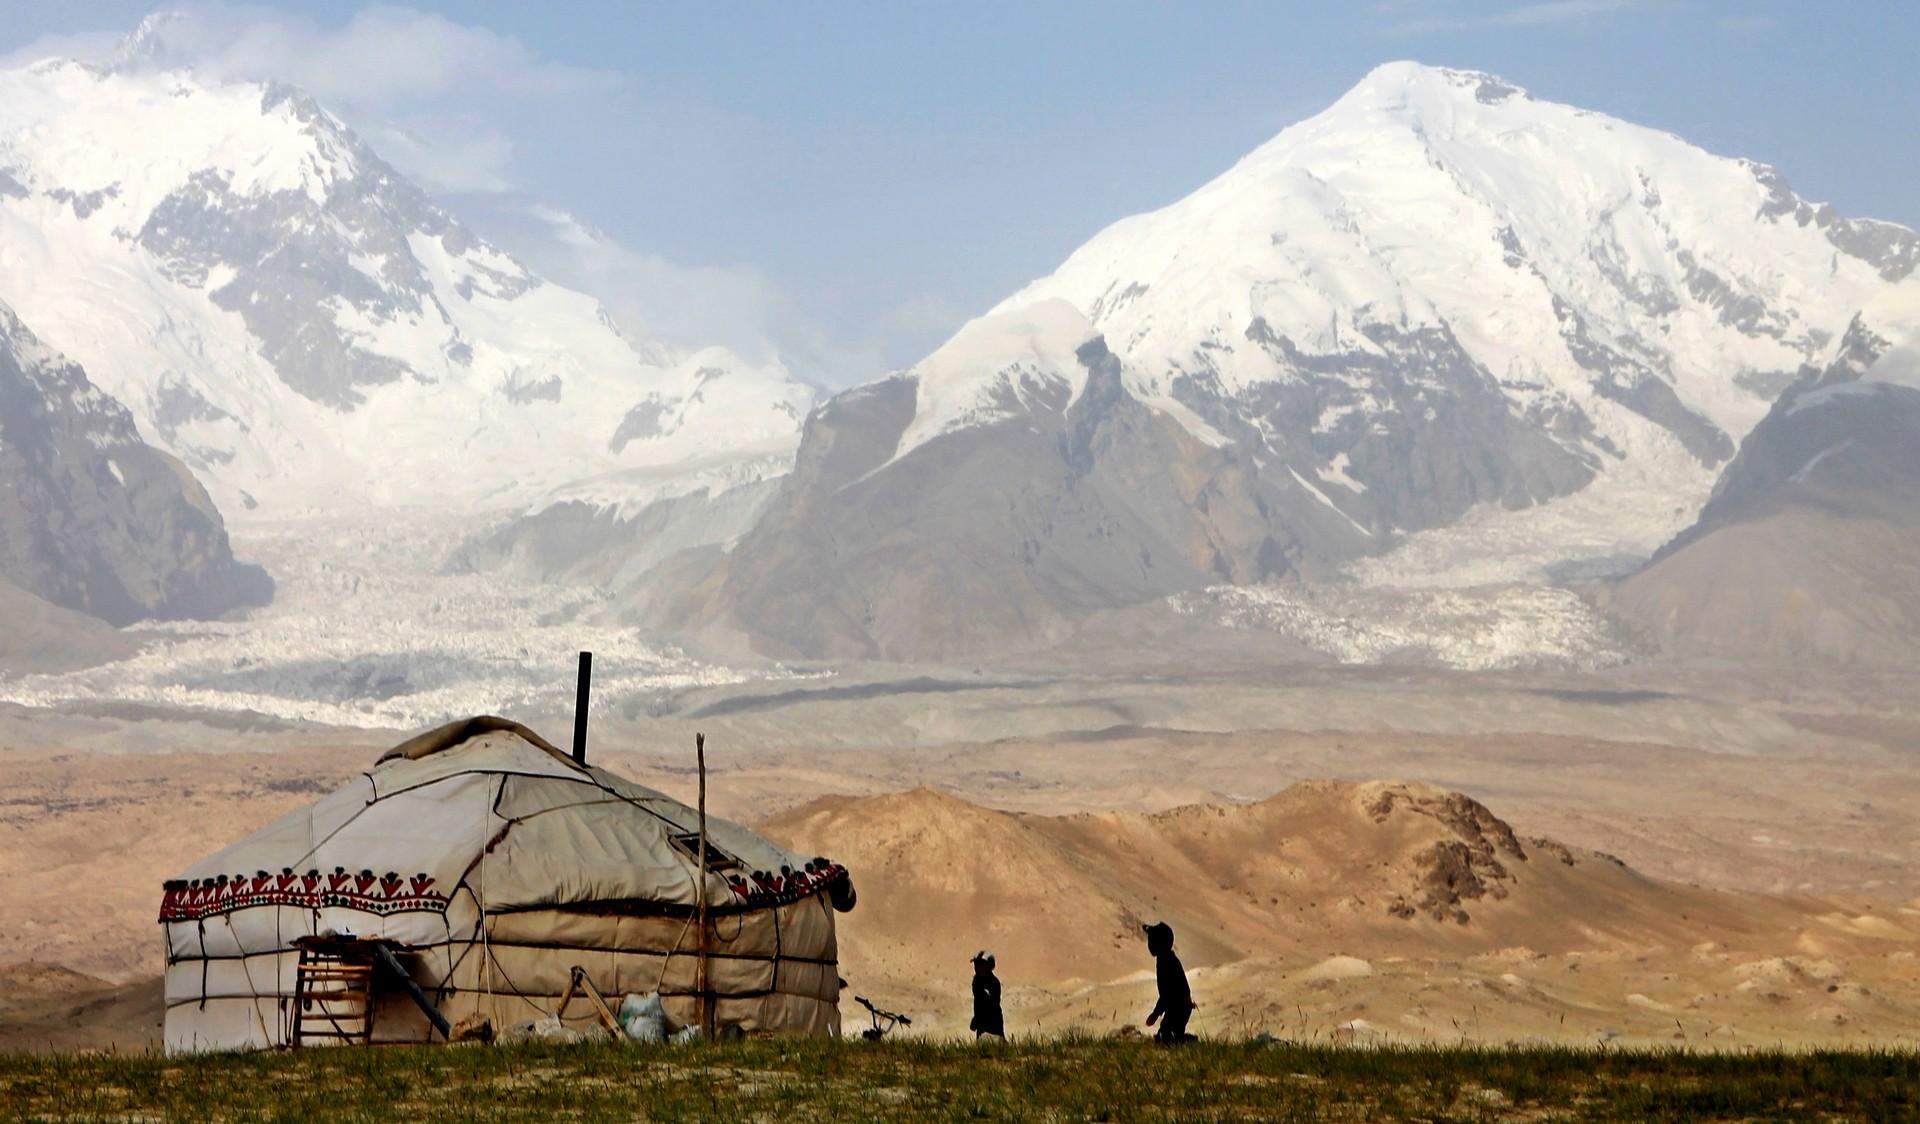 Children playing outside yurt in Tajikistan, China